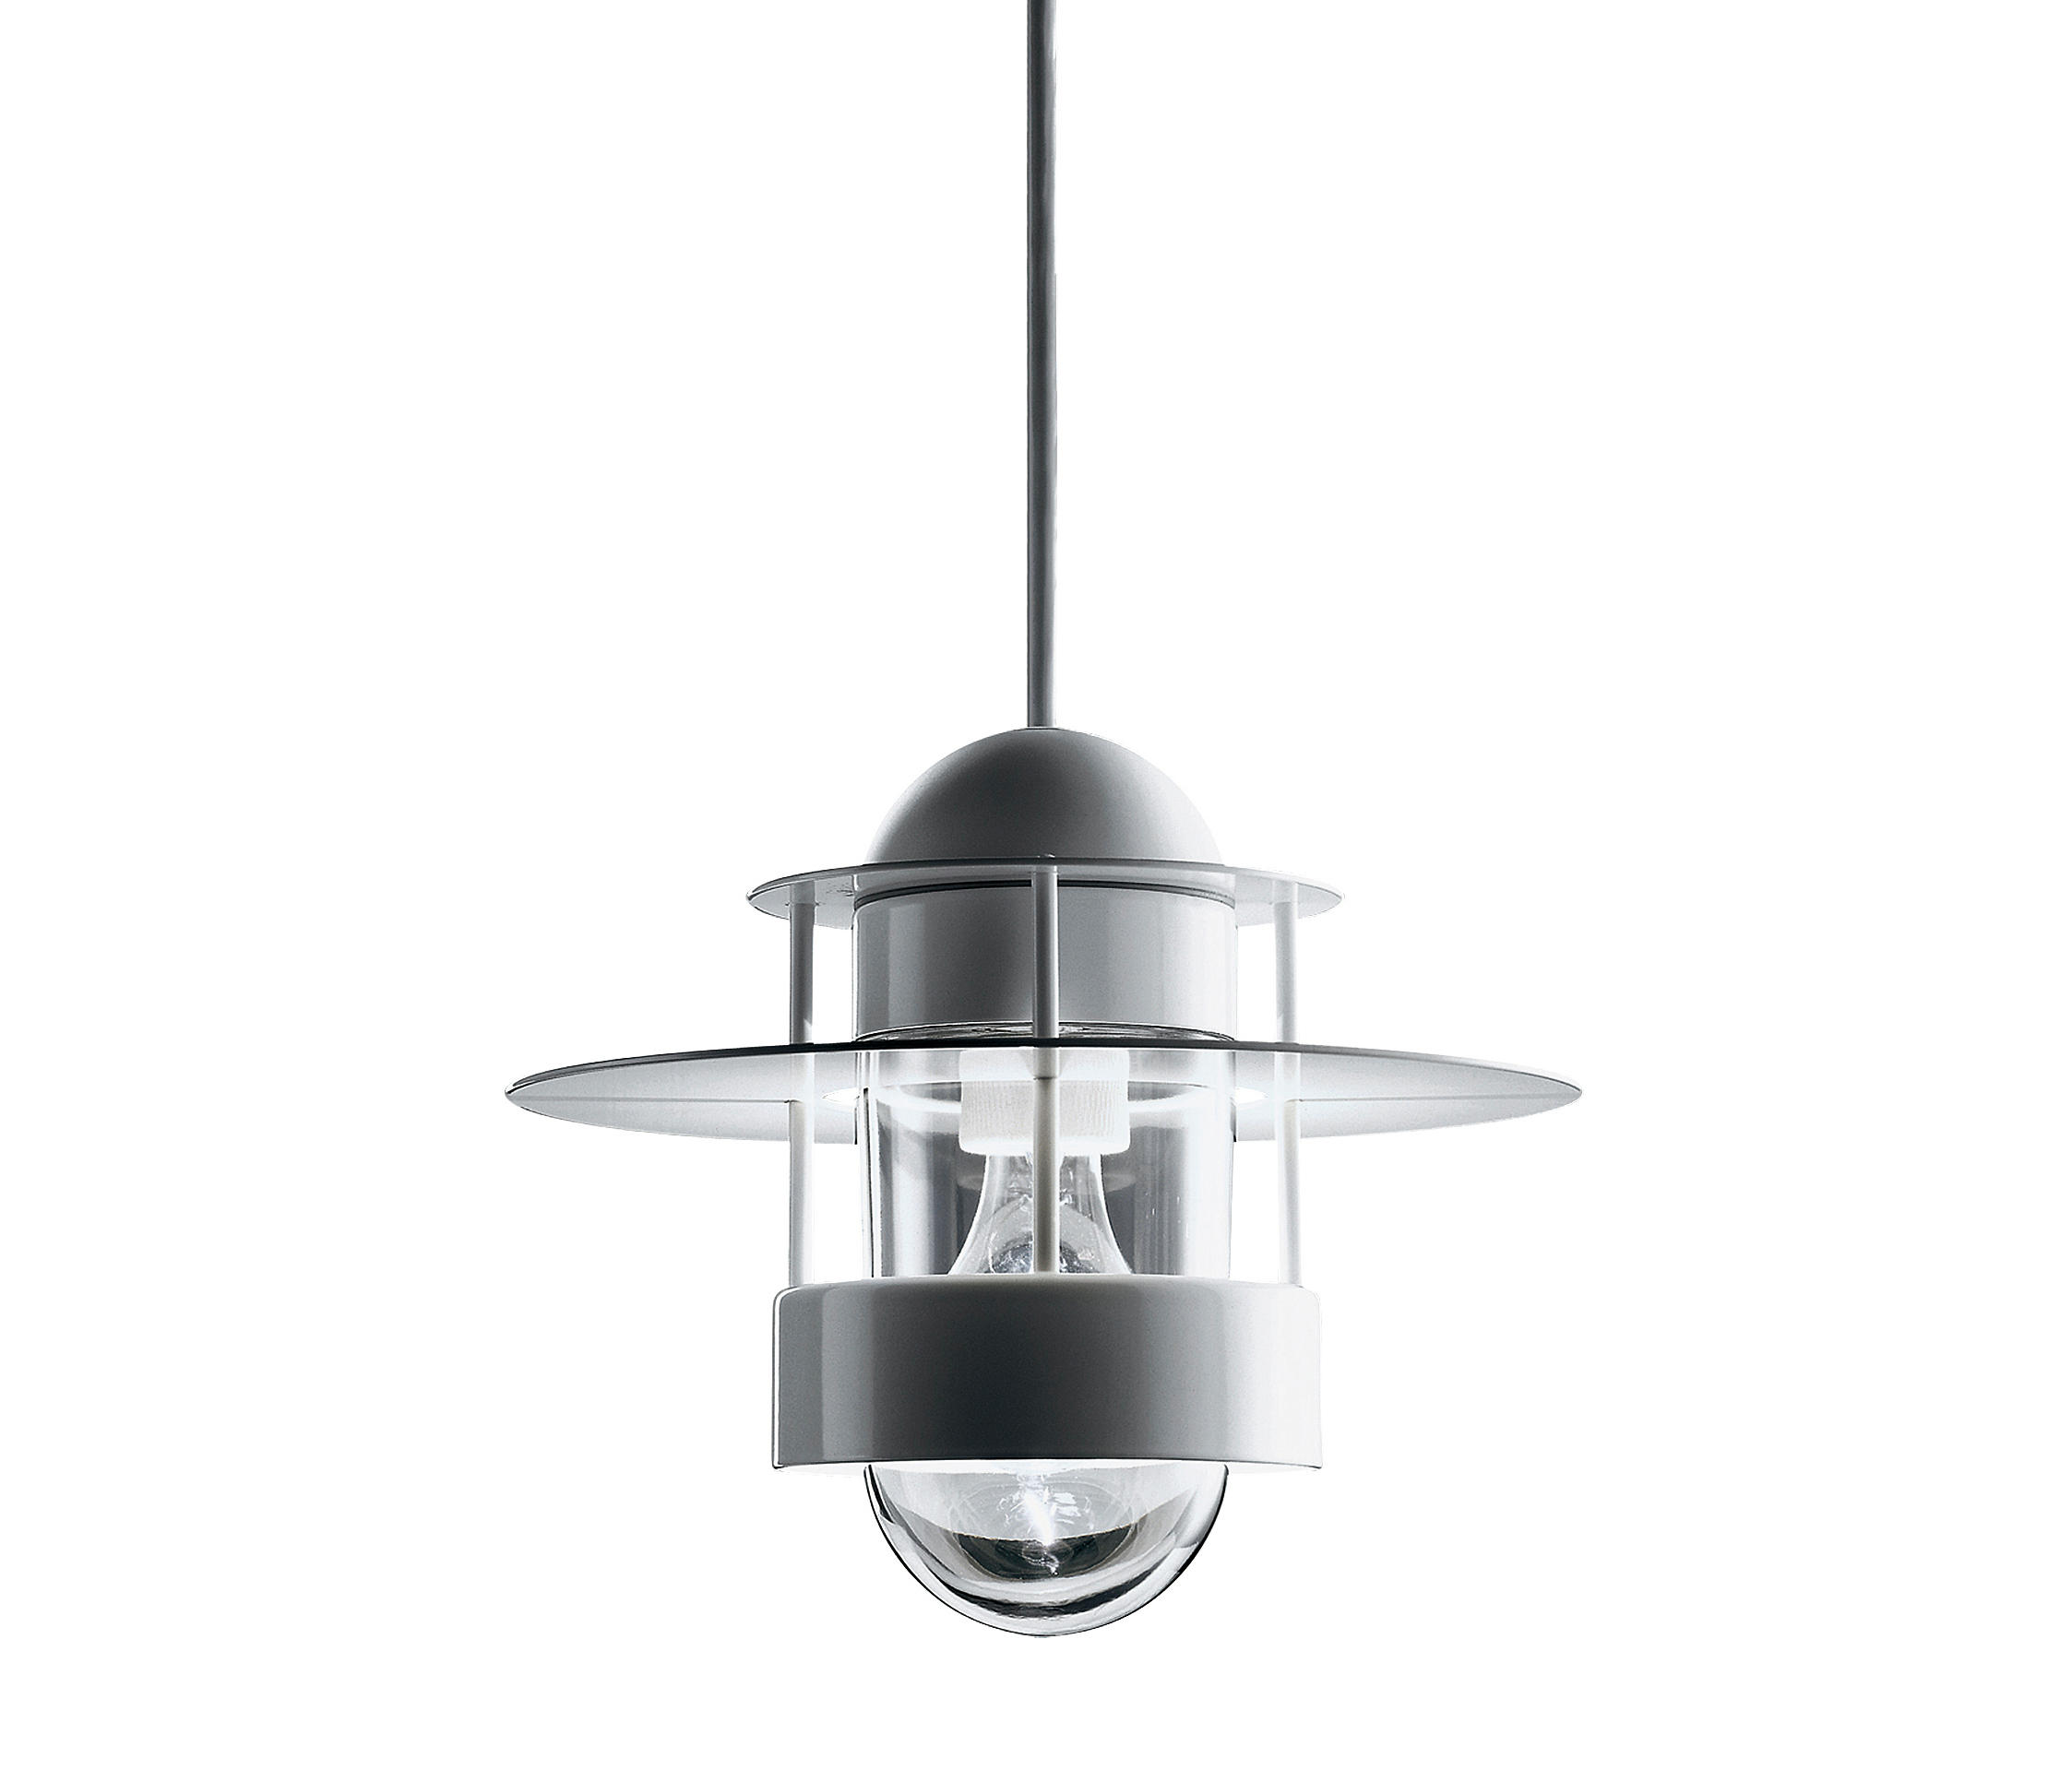 albertslund pendant general lighting from louis poulsen. Black Bedroom Furniture Sets. Home Design Ideas